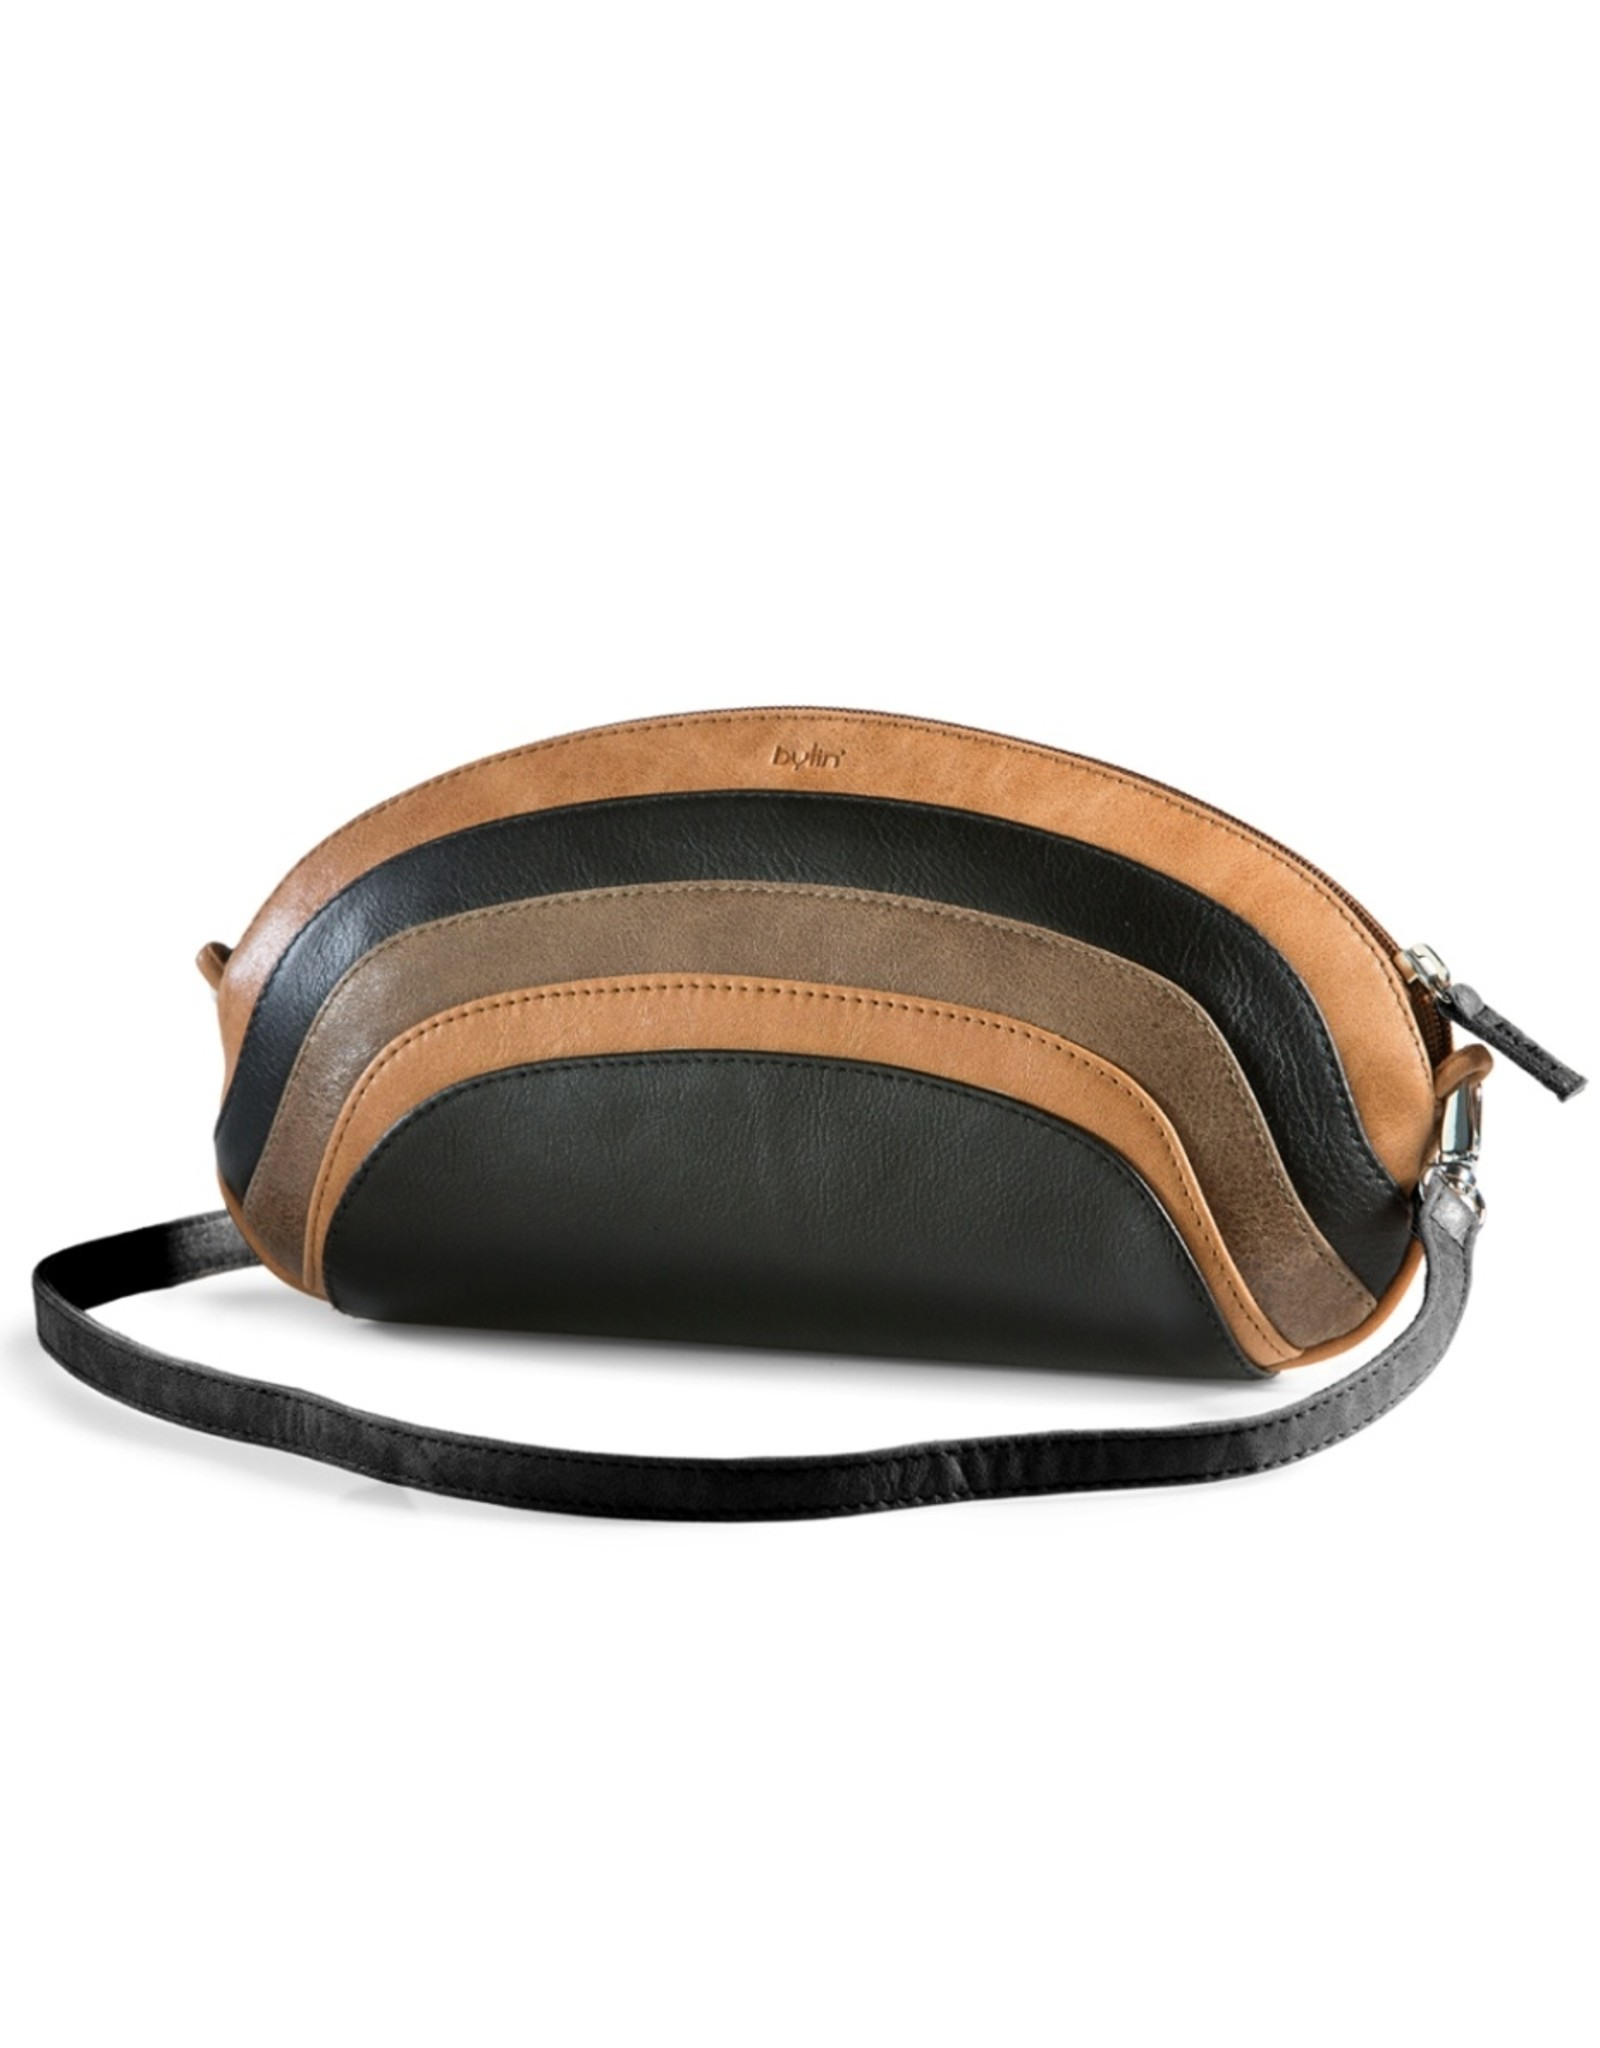 ByLin Dutch Design Leather bags - by-Lin Dutch Design Rainbow Leather shoulder bag